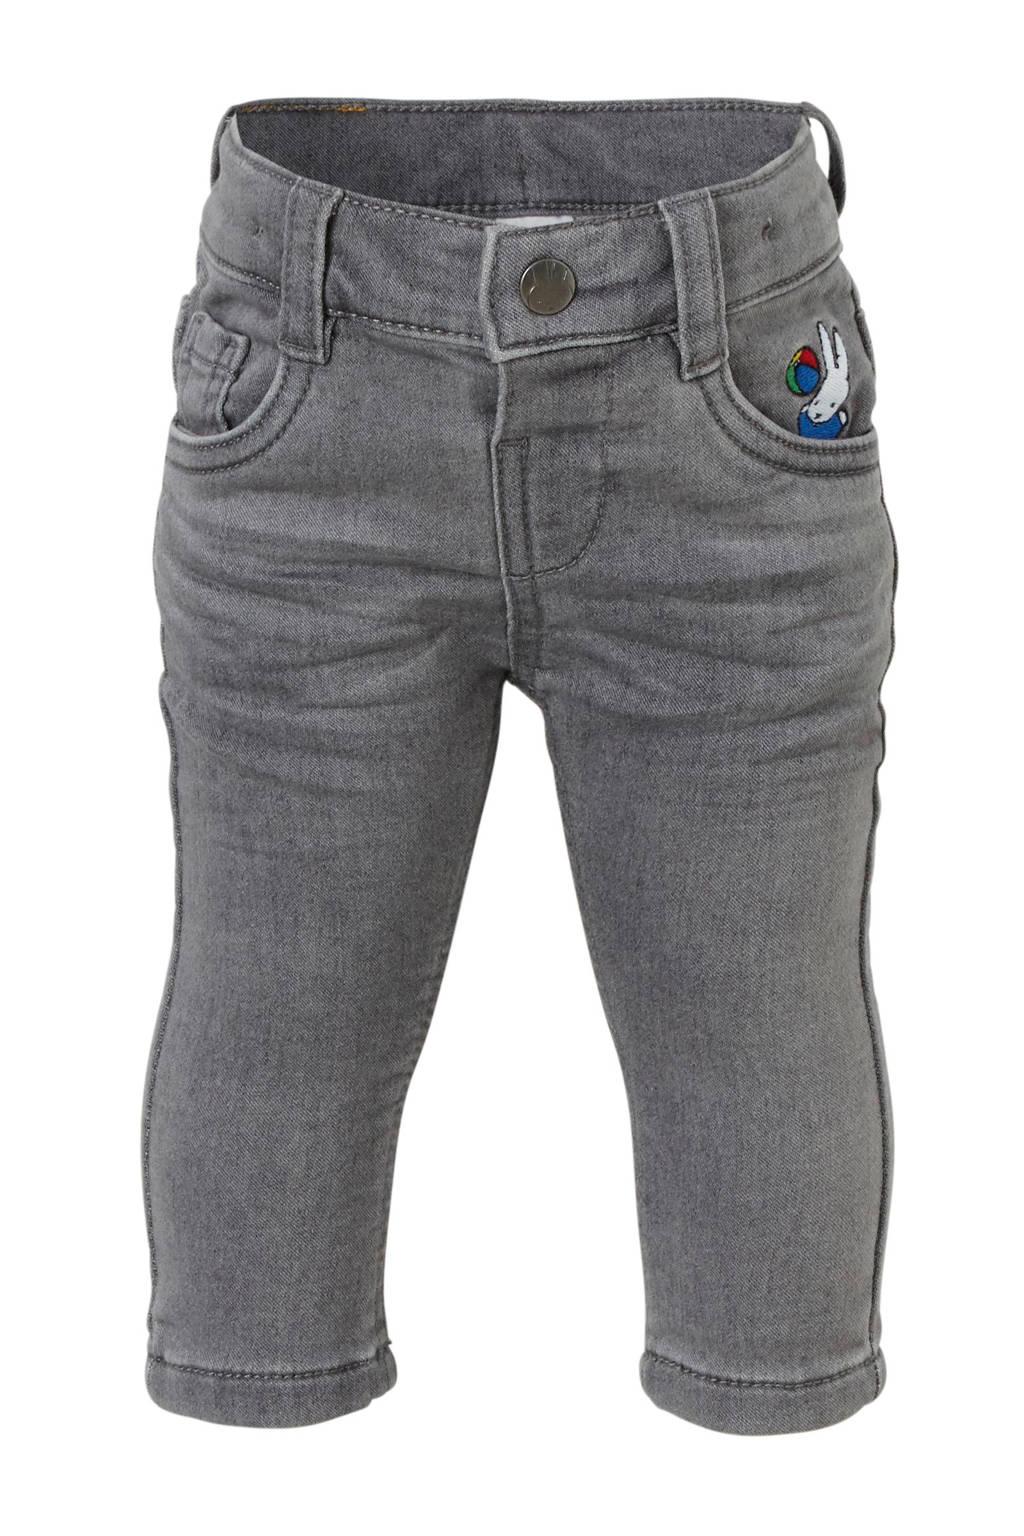 C&A nijntje skinny jeans grijs, Grijs